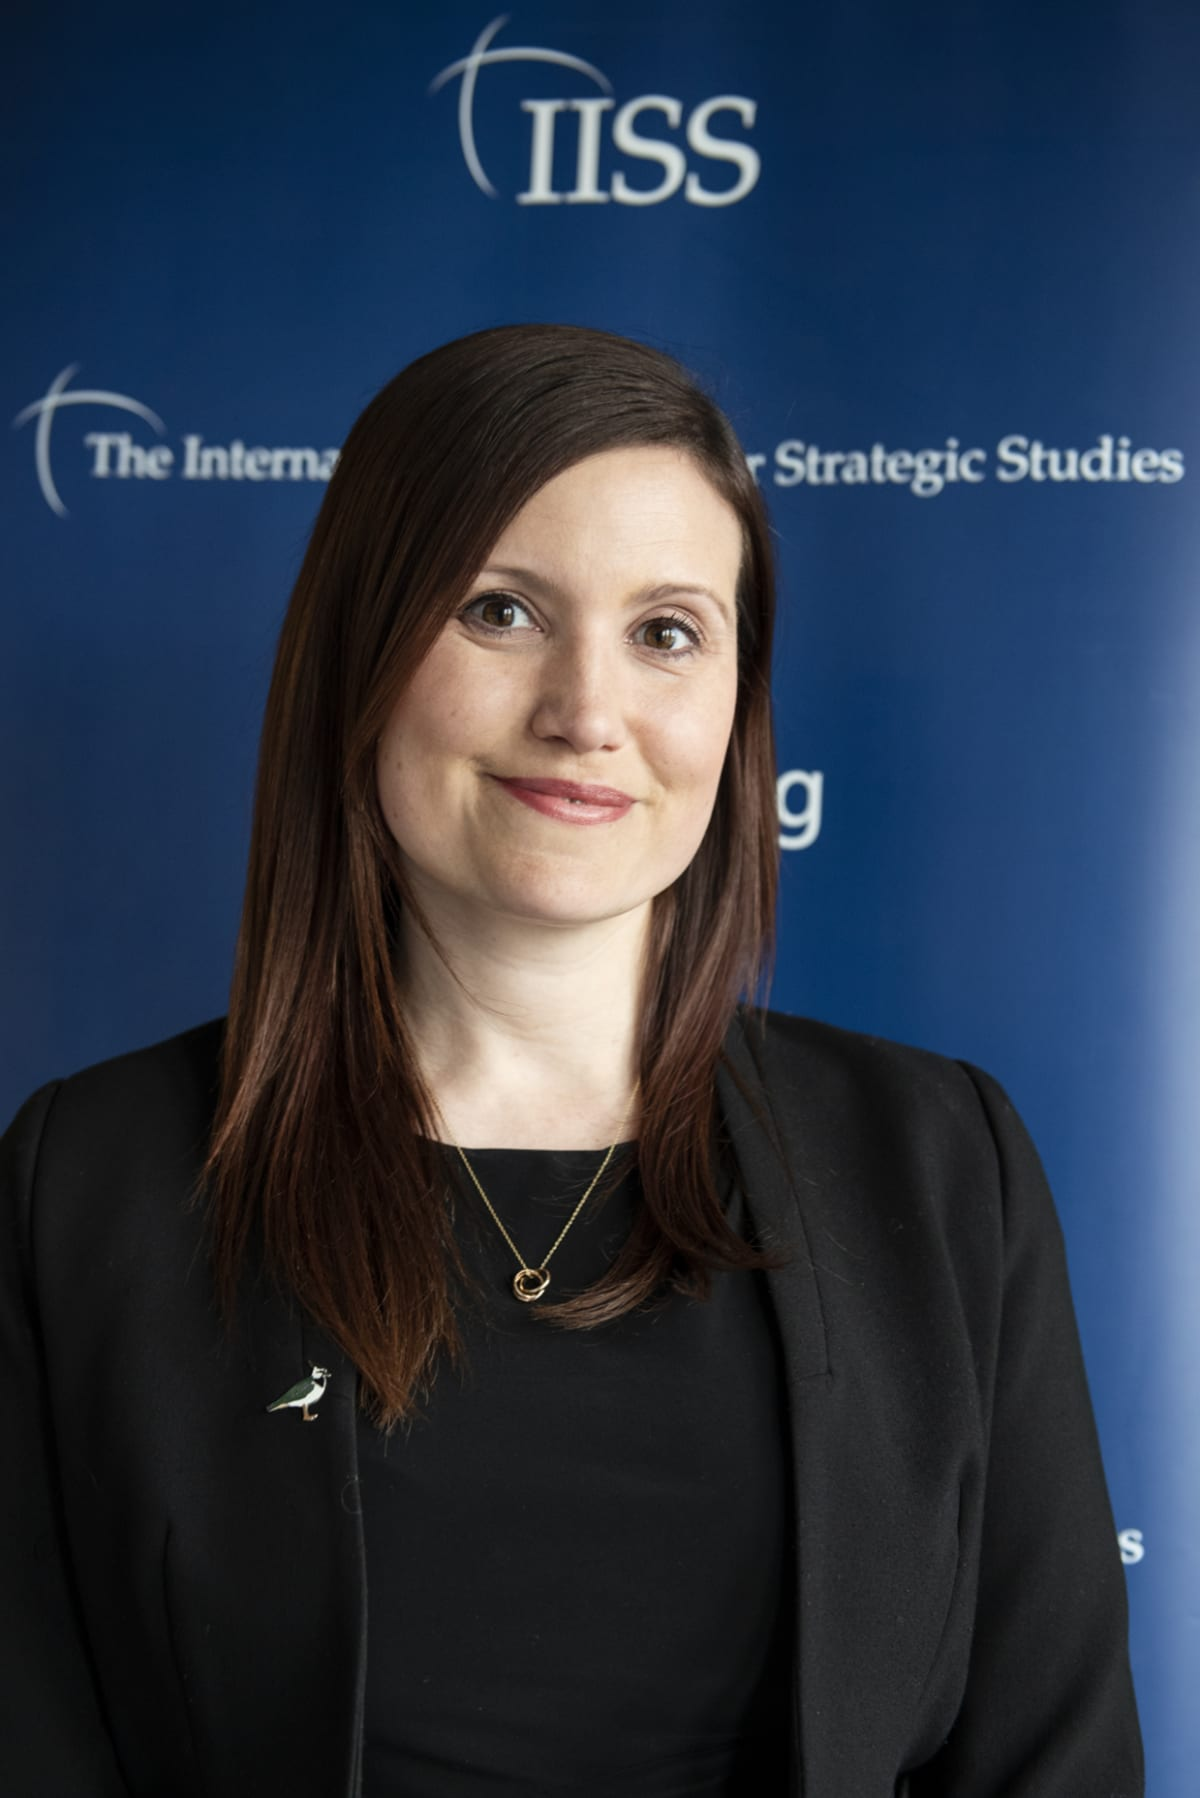 Fenella McGerty, vanhempi tutkija, IISS